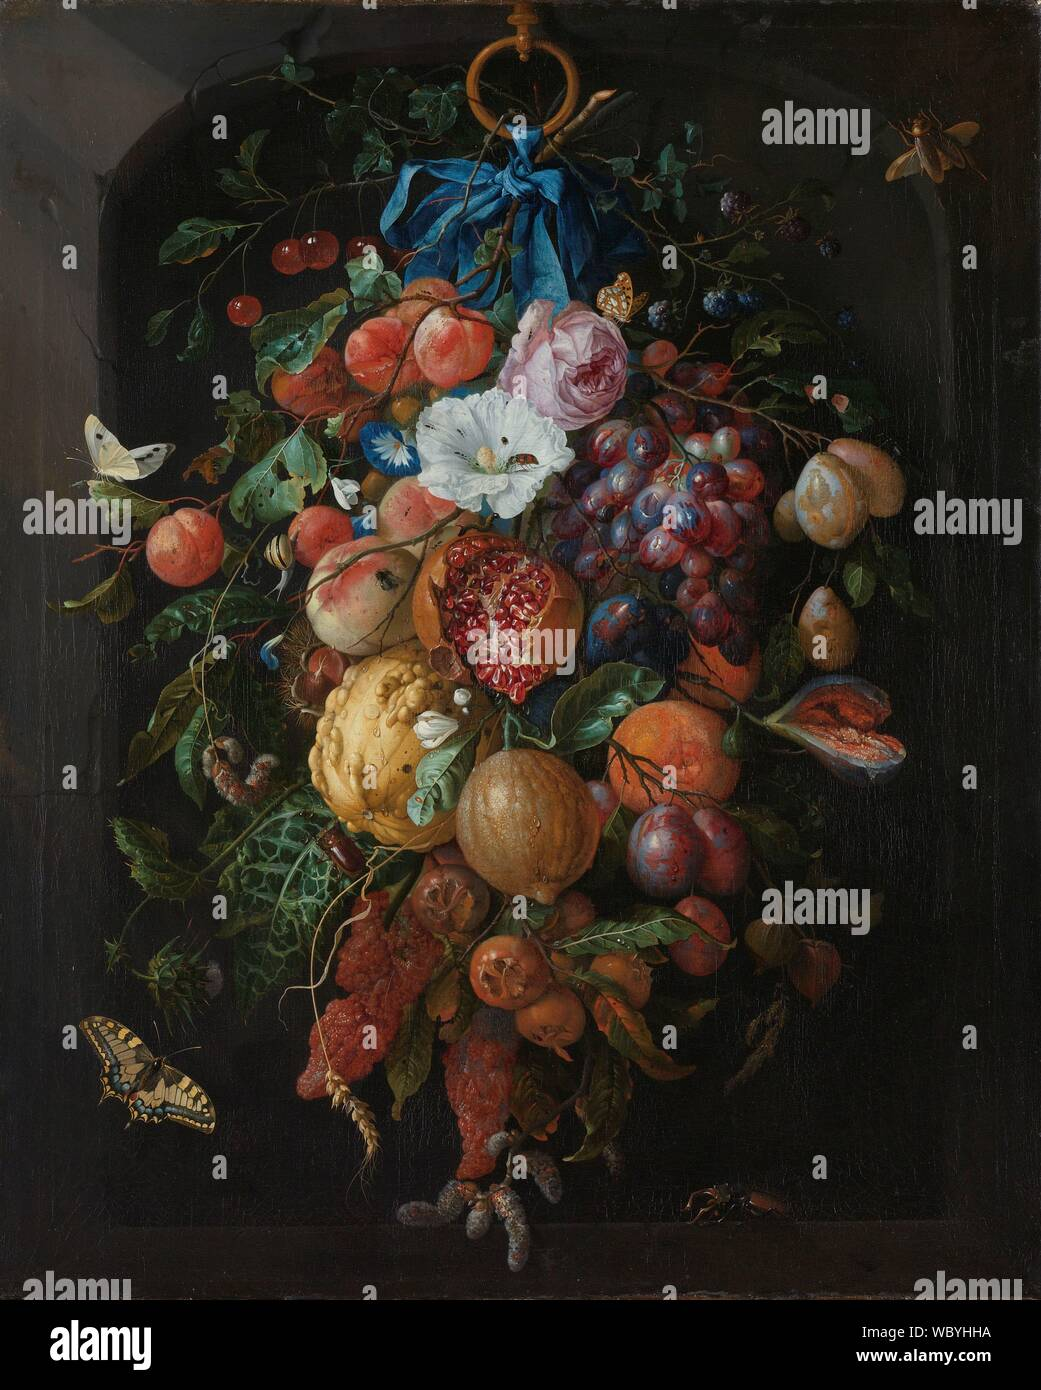 Festone di fiori e frutti, Jan Davidsz de Heem, 1660 n 1670.jpg - WBYHHA Foto Stock